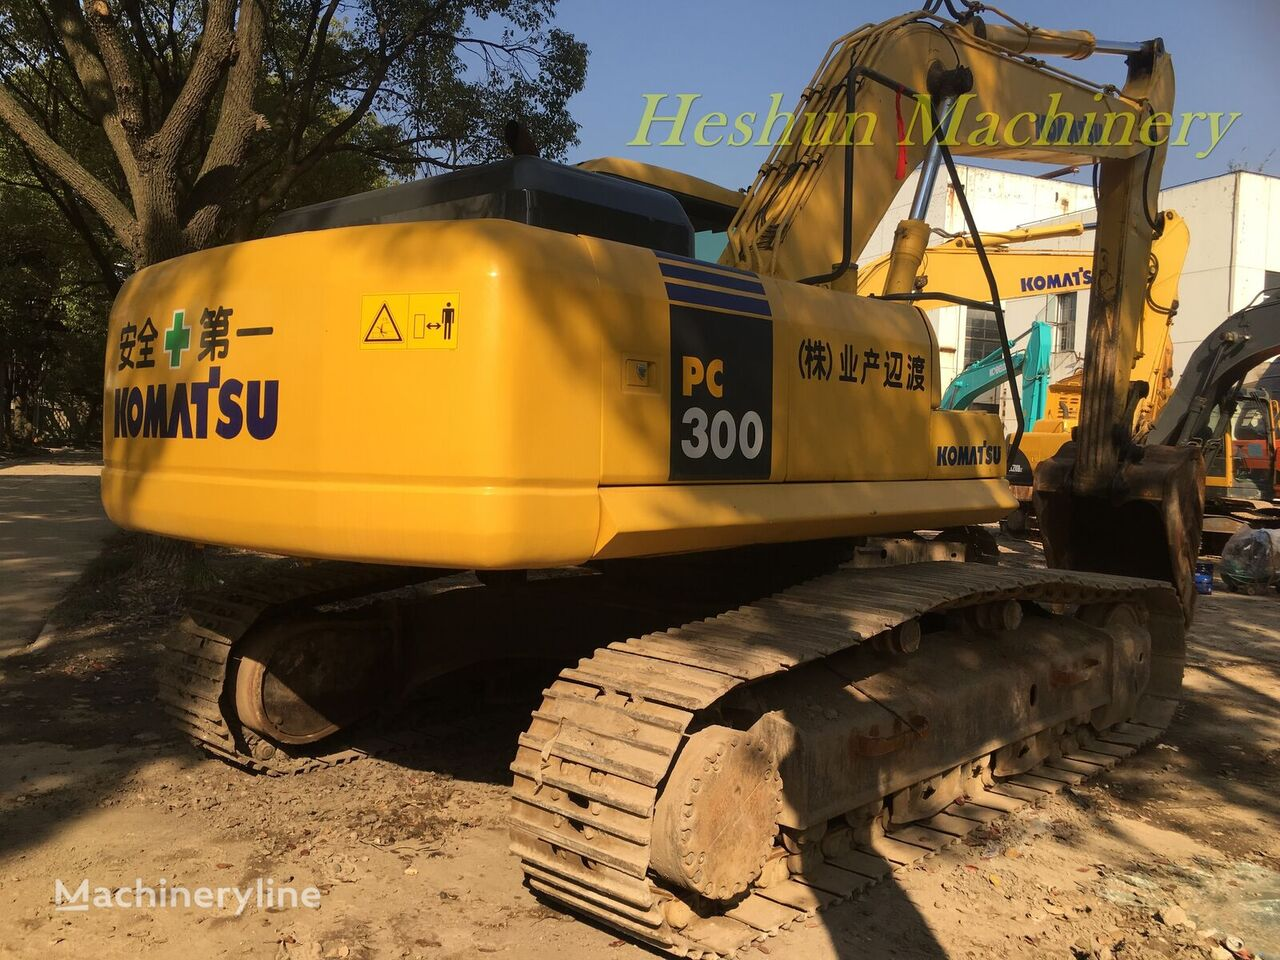 KOMATSU pc300 tracked excavator